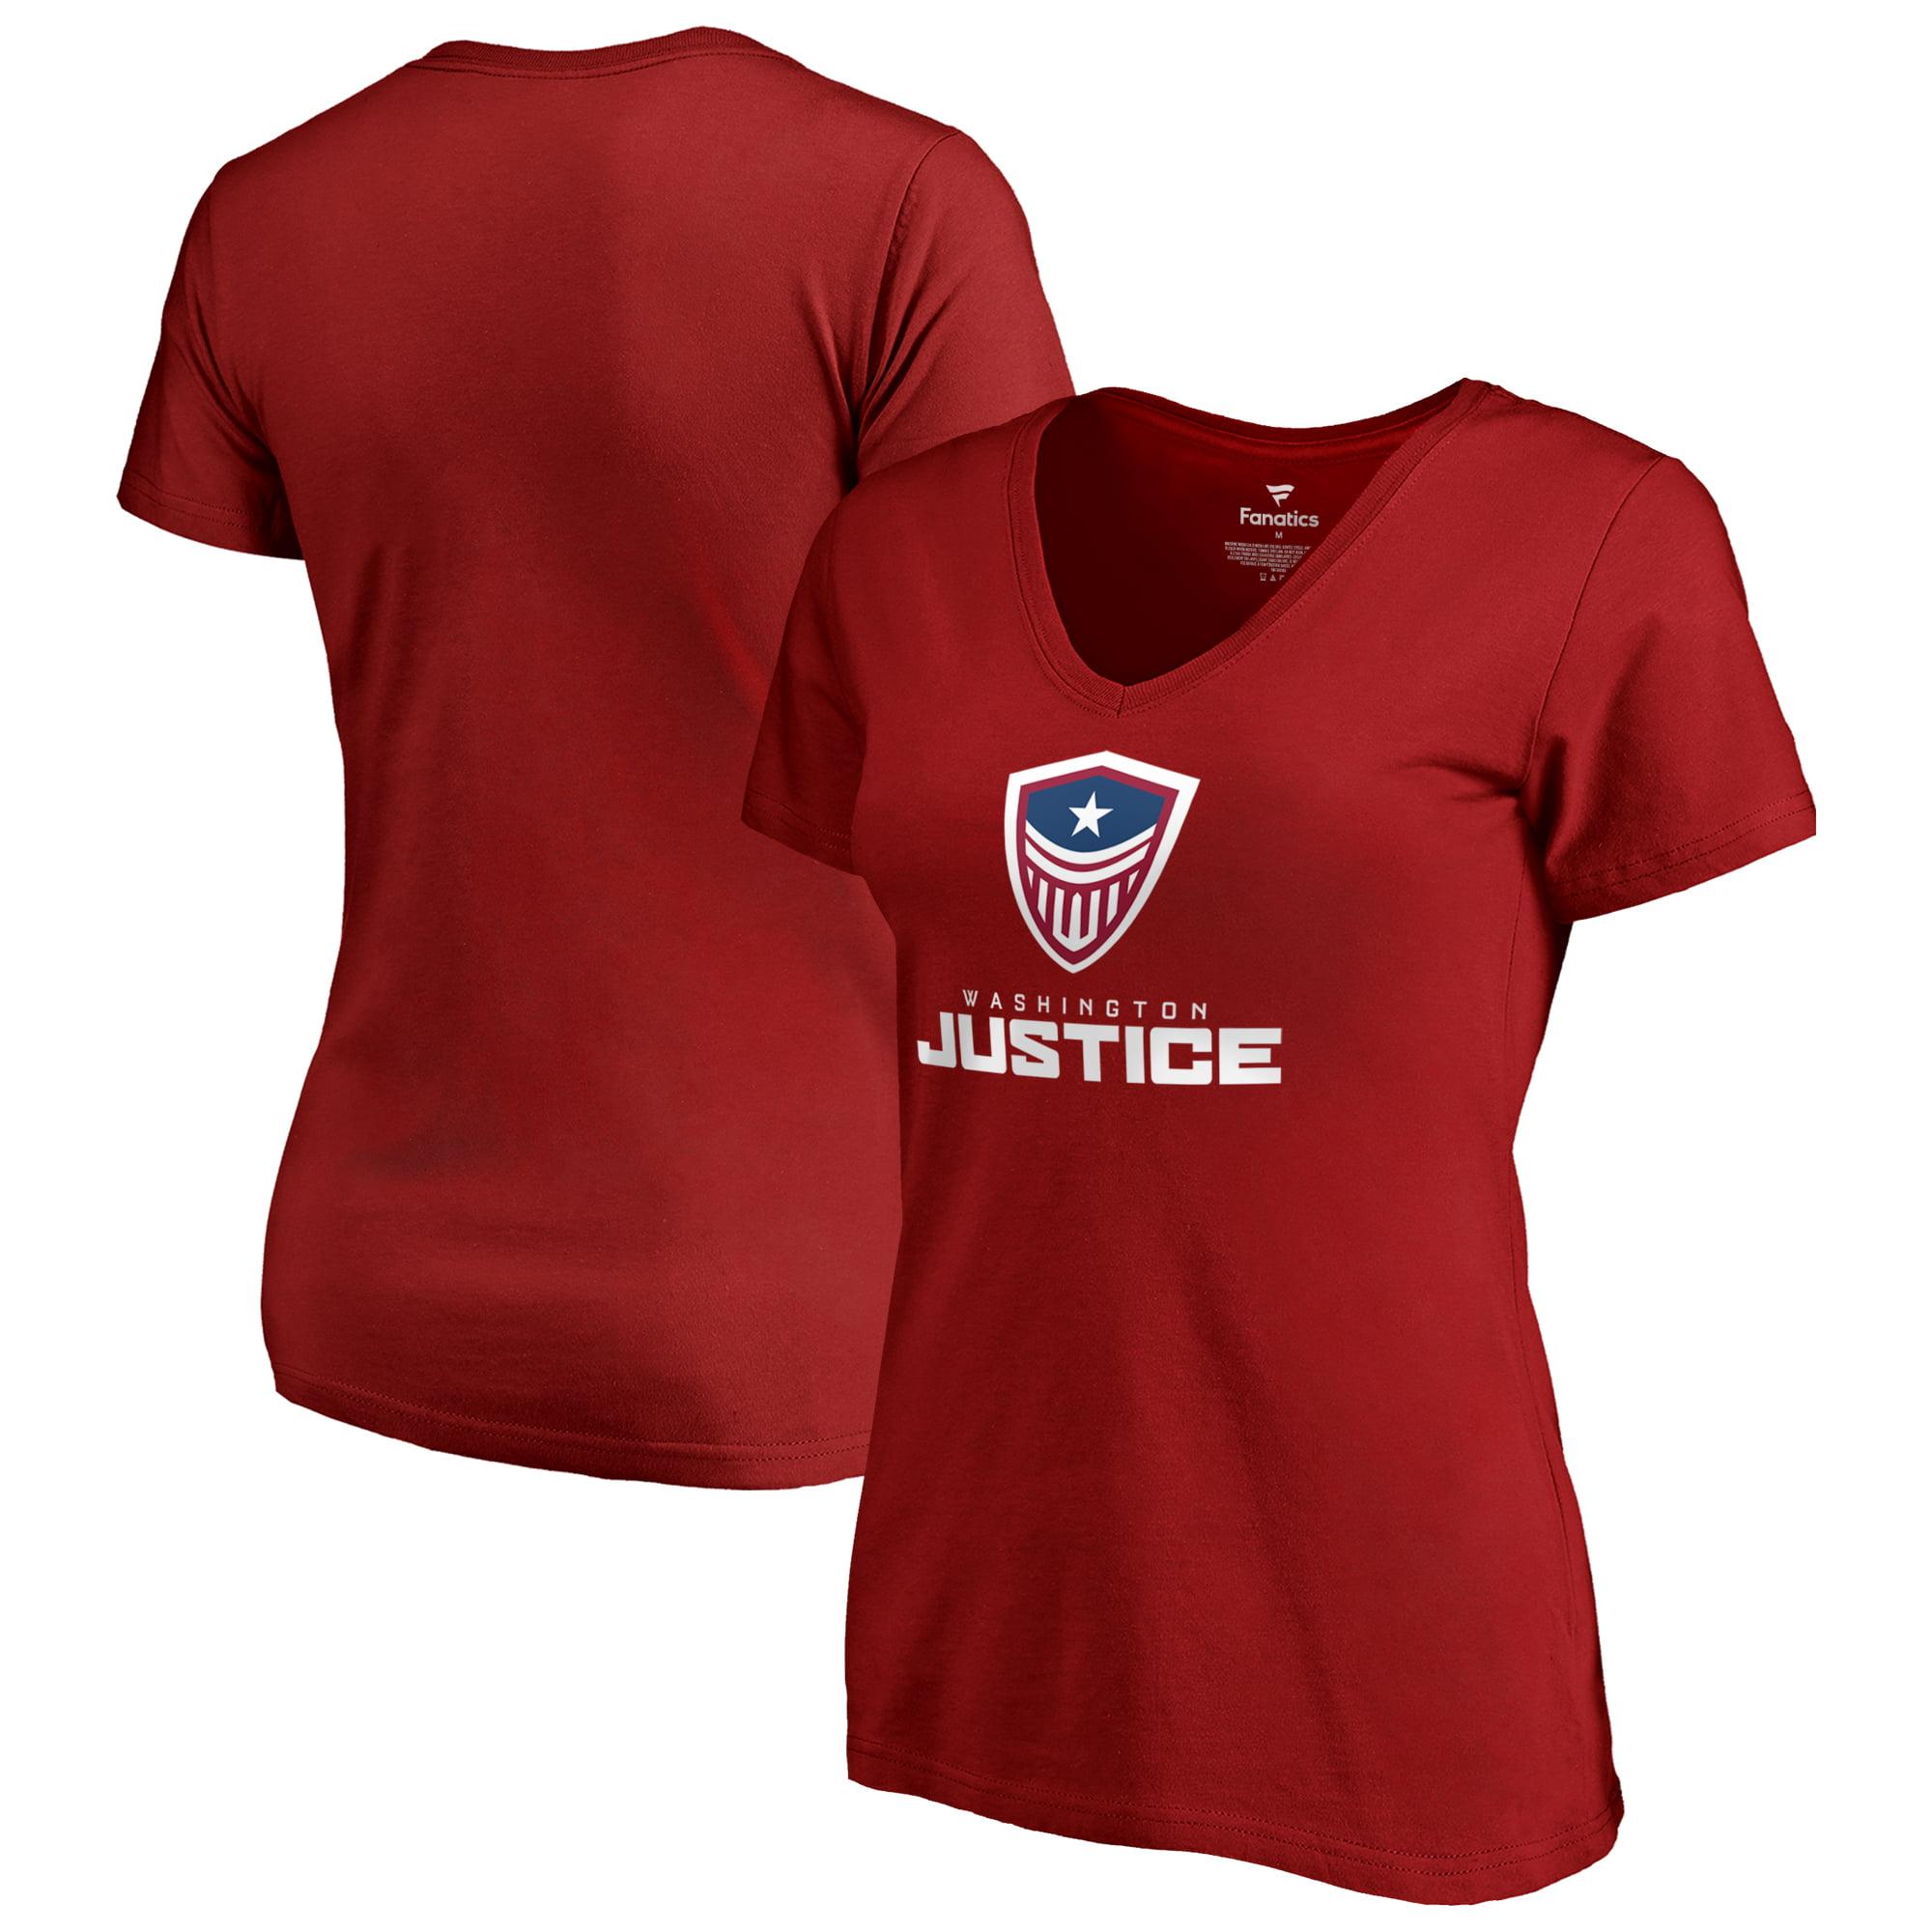 Washington Justice Fanatics Branded Women's Team Identity V-Neck T-Shirt - Cardinal